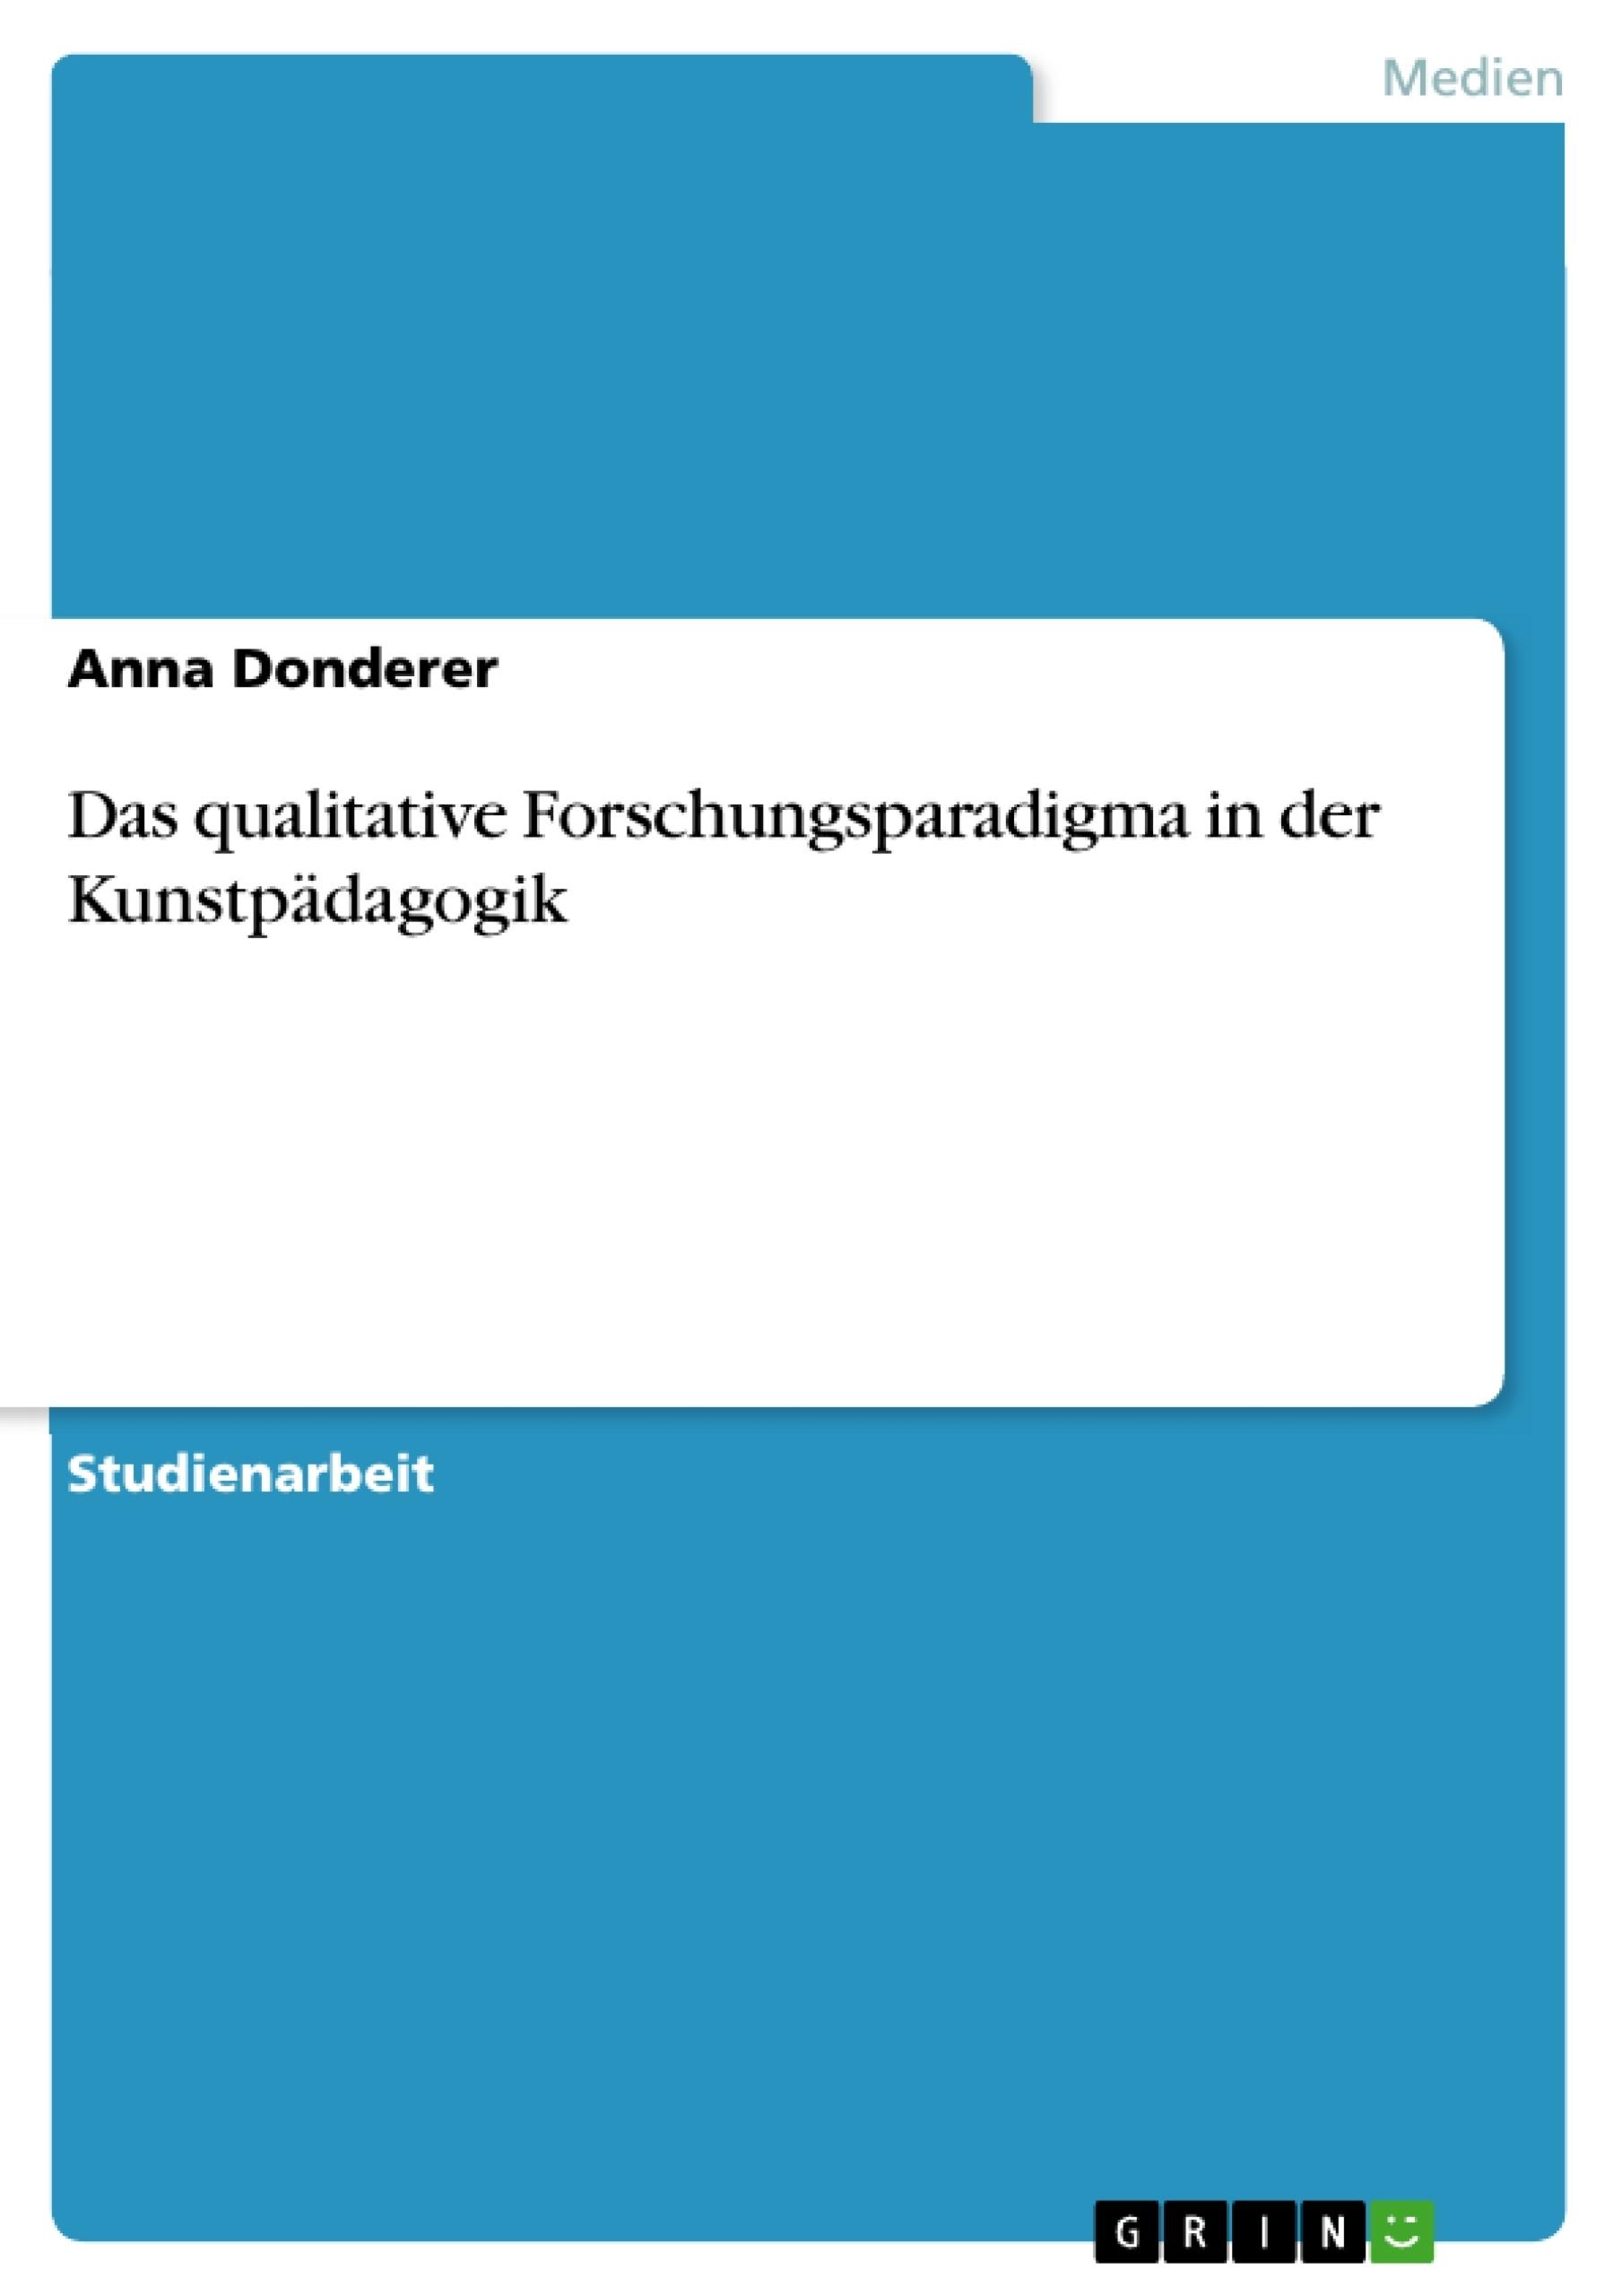 Titel: Das qualitative Forschungsparadigma in der Kunstpädagogik